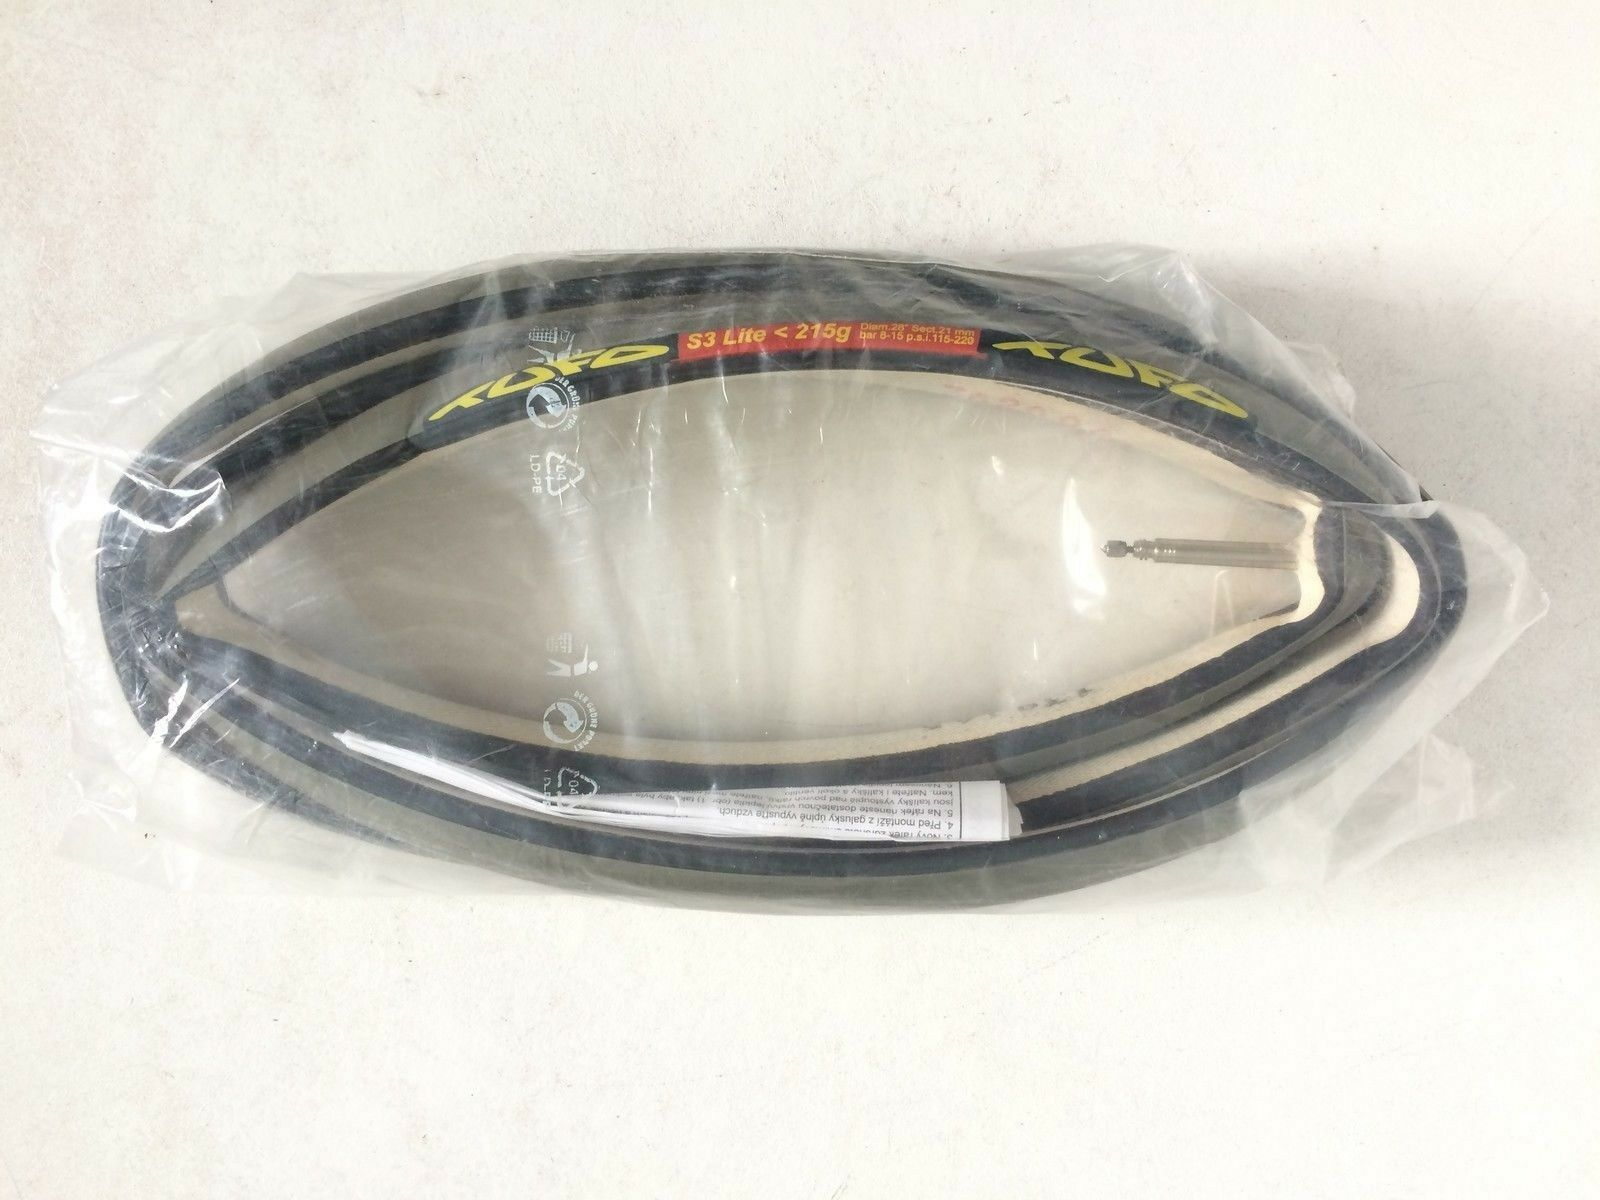 Reifen Schlauch TUFO S3 LITE grau 215gr 215gr 215gr 700x22mm neu 543b94